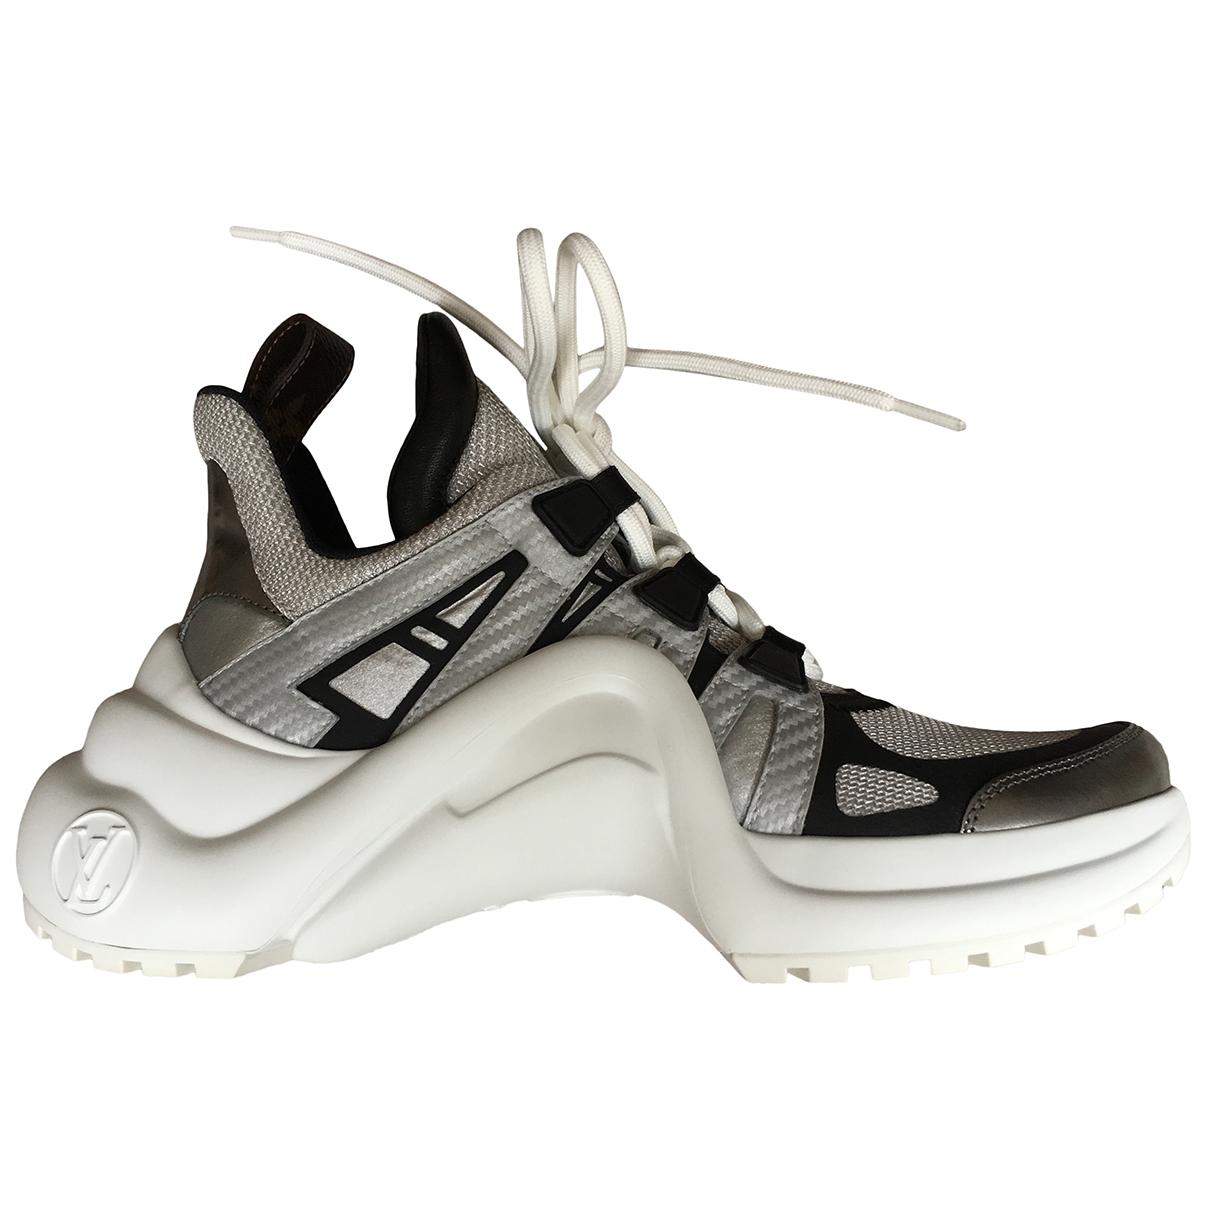 Louis Vuitton Archlight Sneakers in  Grau Leder